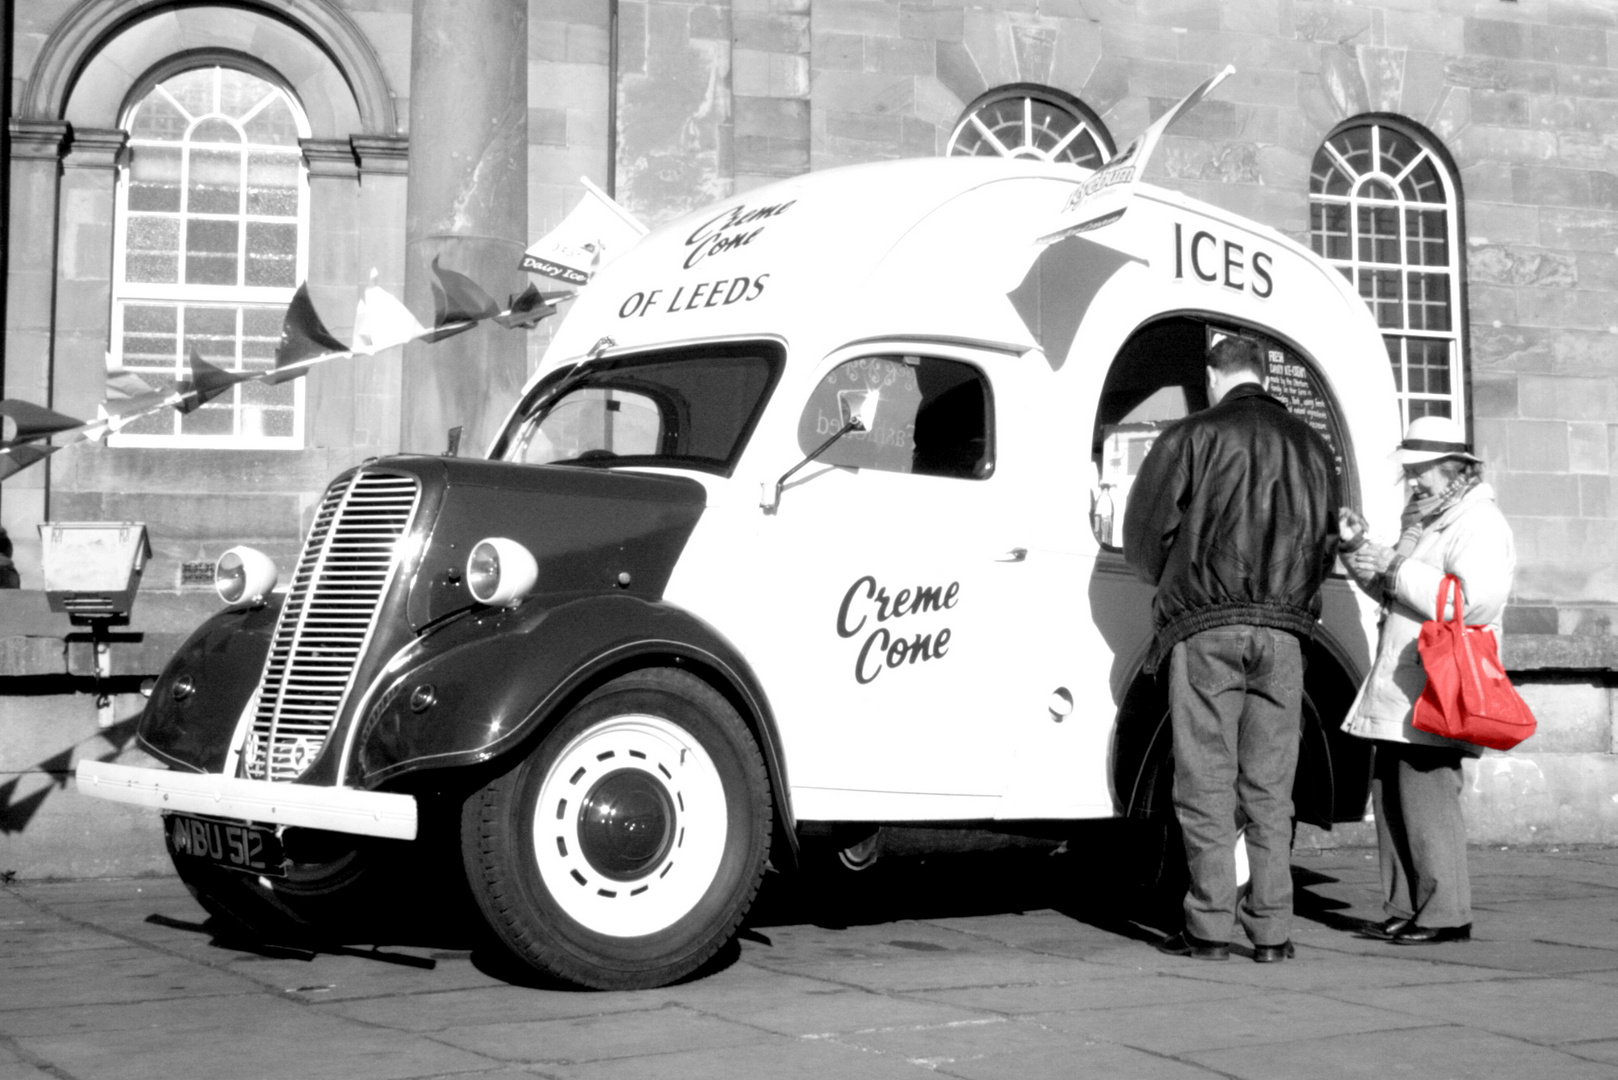 Creme Cone of Leeds